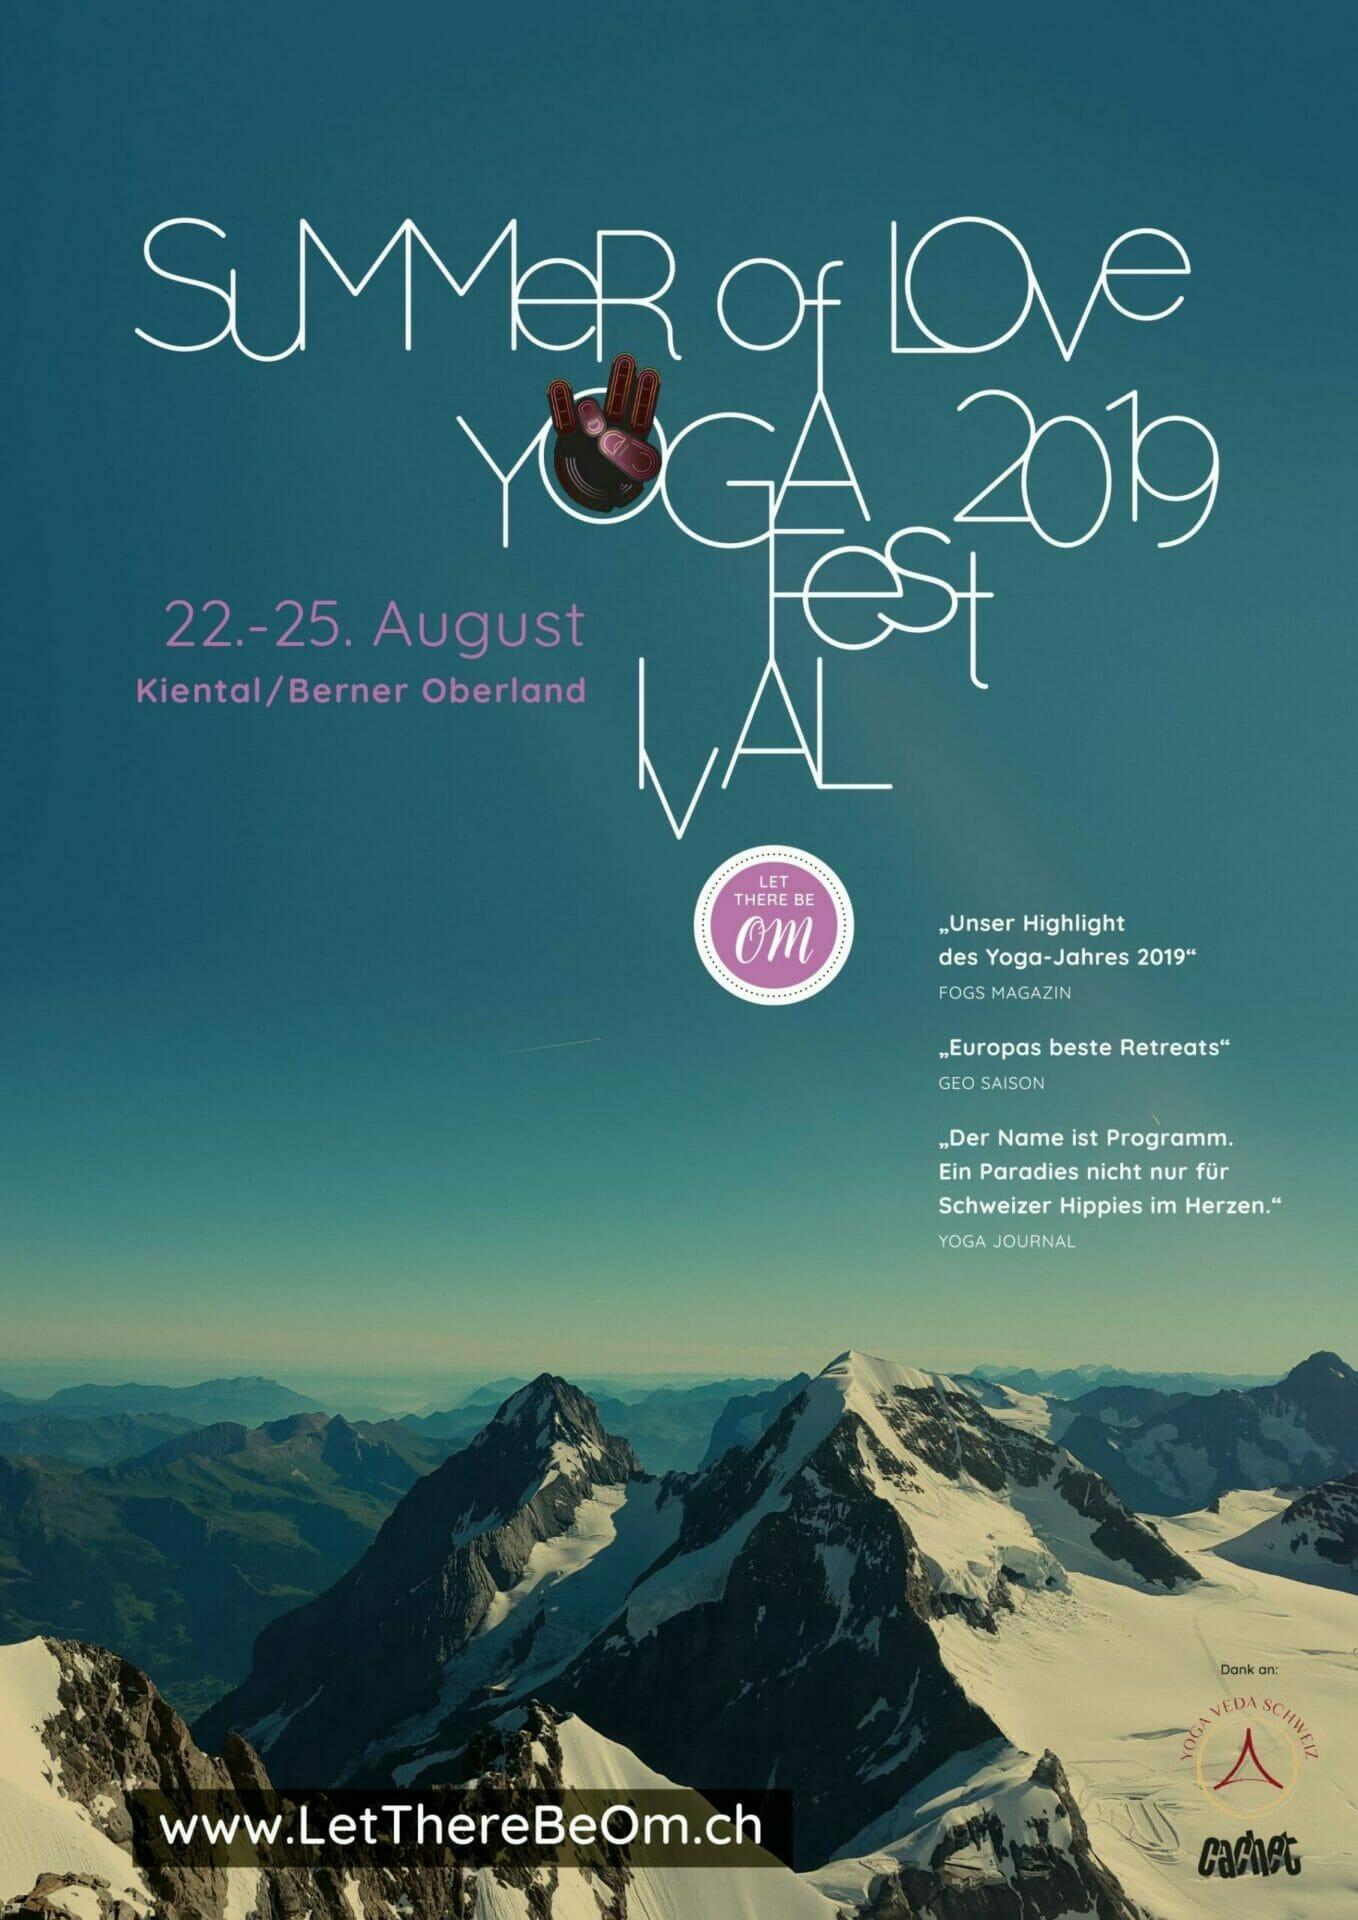 Summer of Love Yogafestival Poster